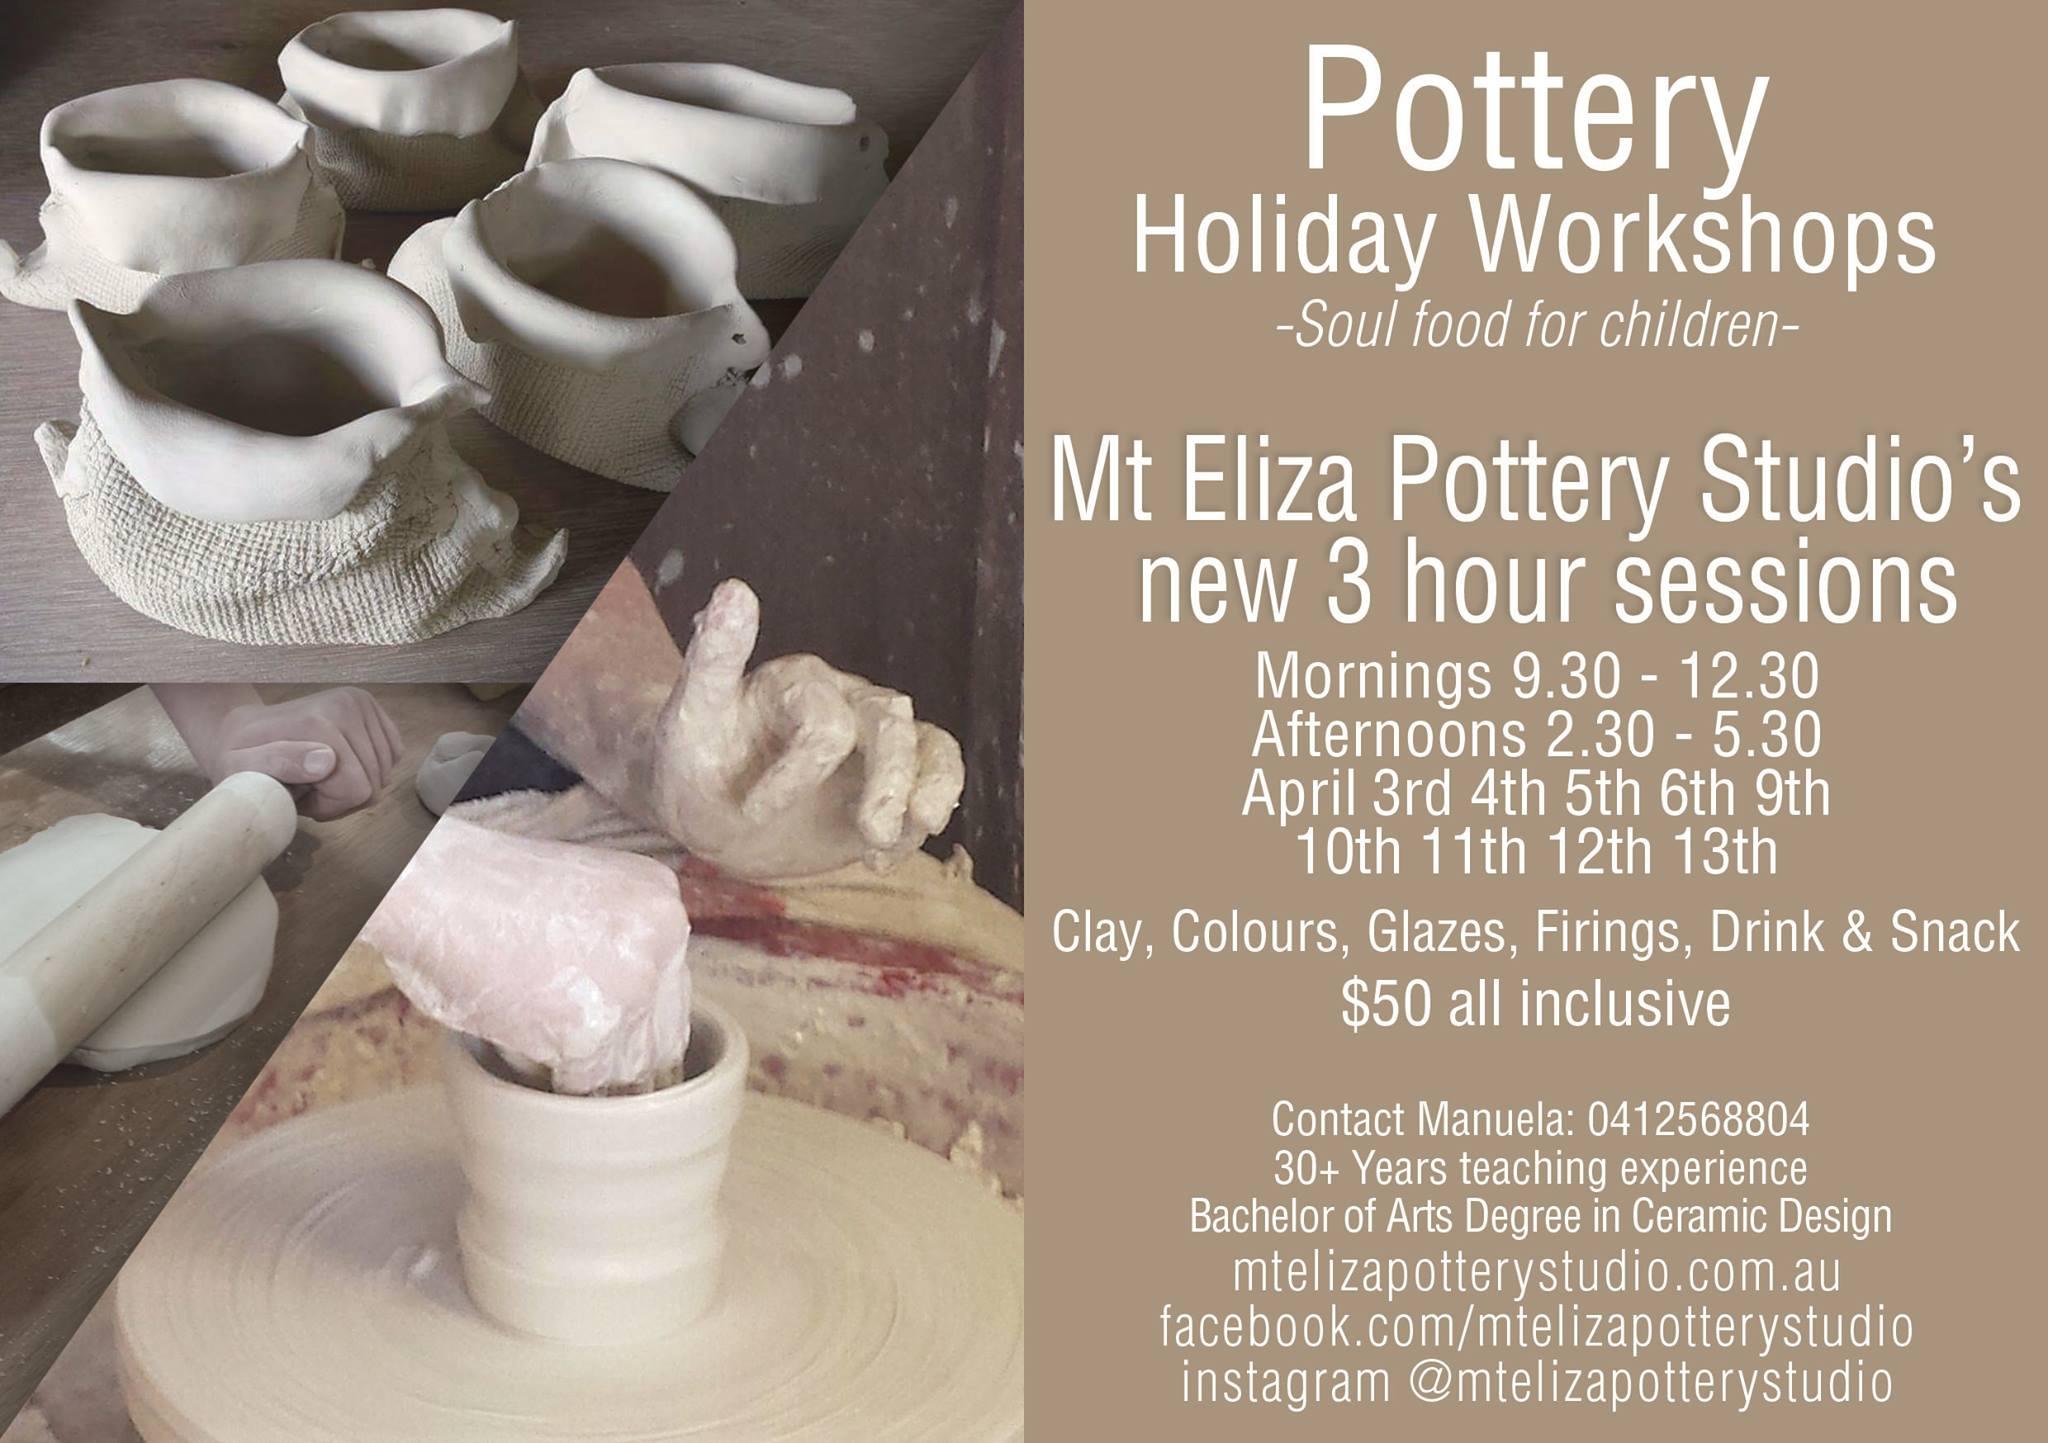 mt eliza pottery classes.jpg